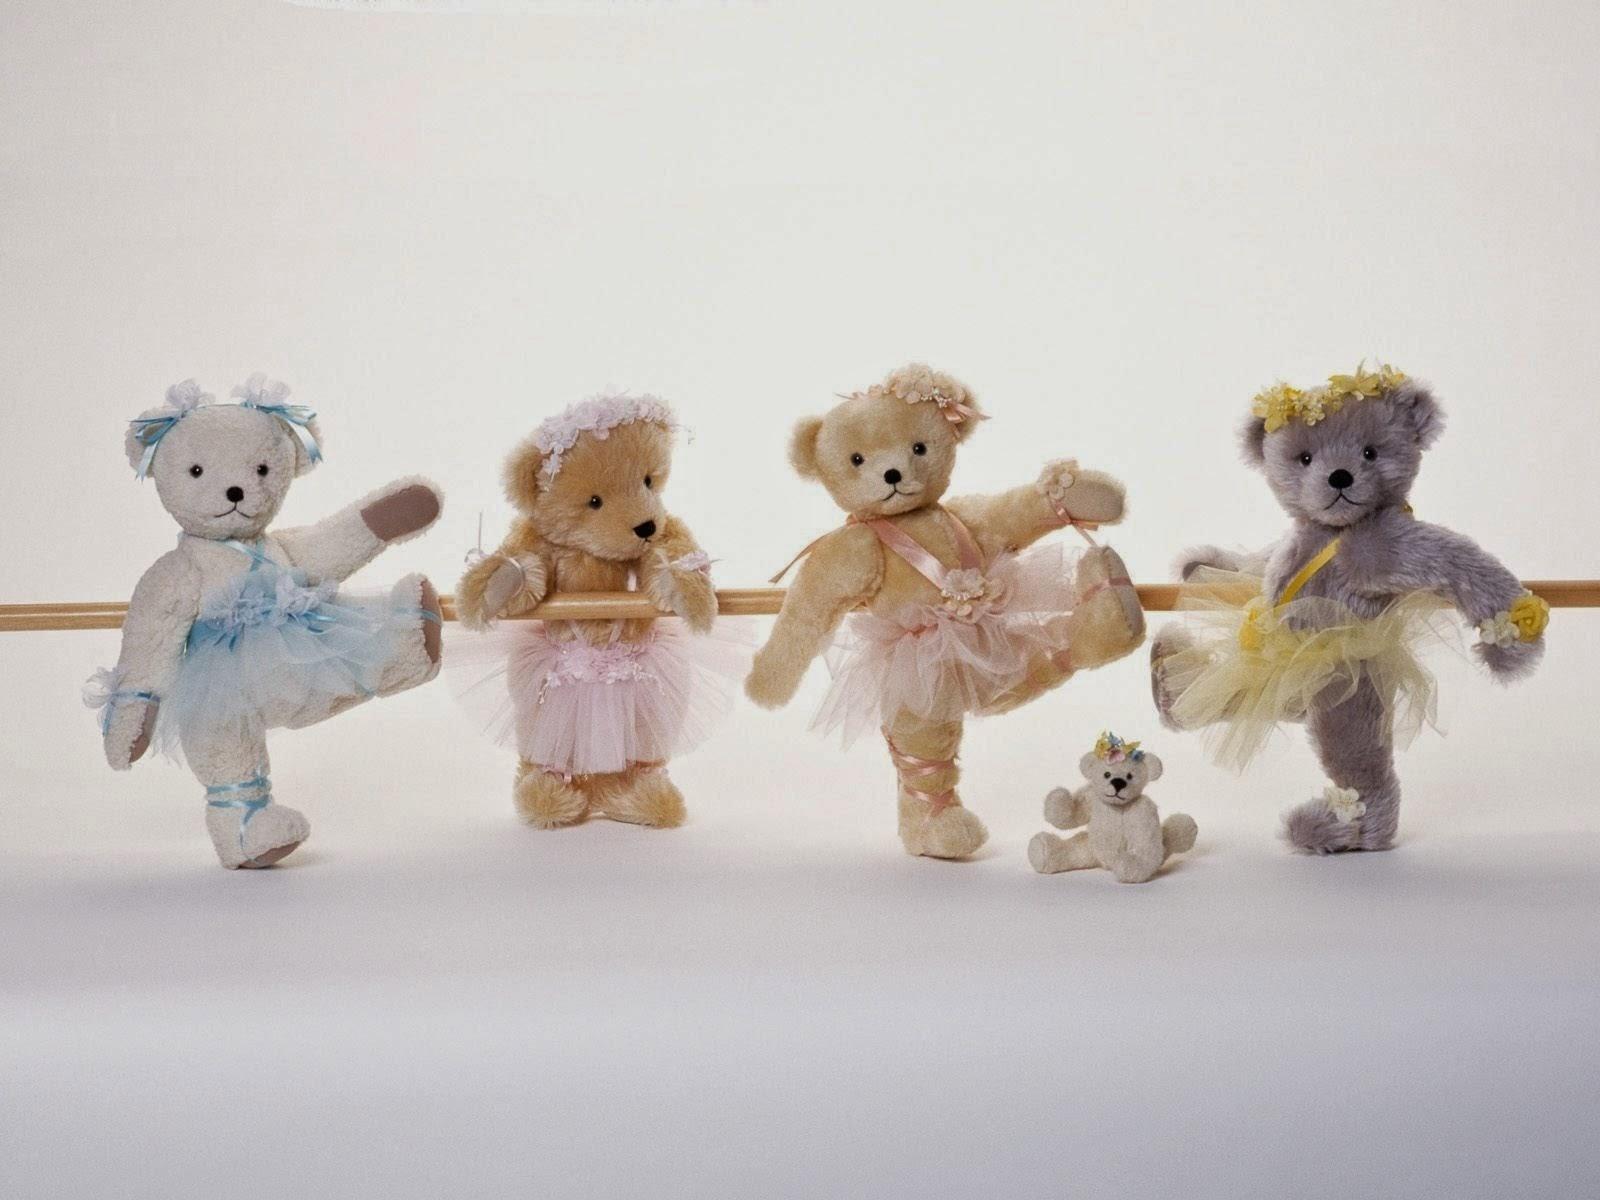 Cute-Teddy-Bear-for-little-kids-and-children-PIXHOME-wallpaper-wp3404343